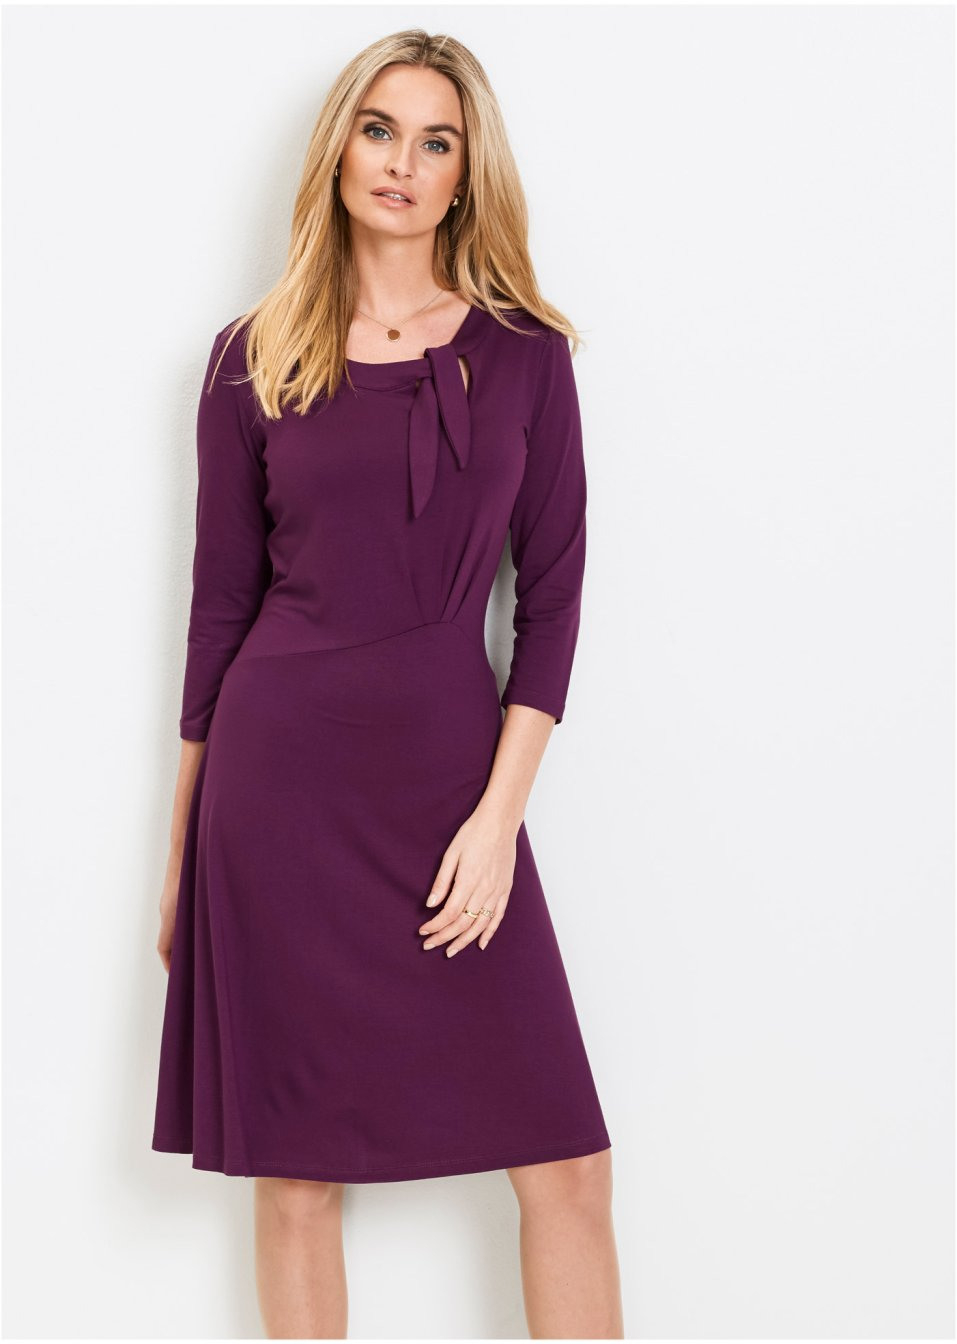 Kleid Dunkellila  Damen  Bpc Selection  Bonprixat